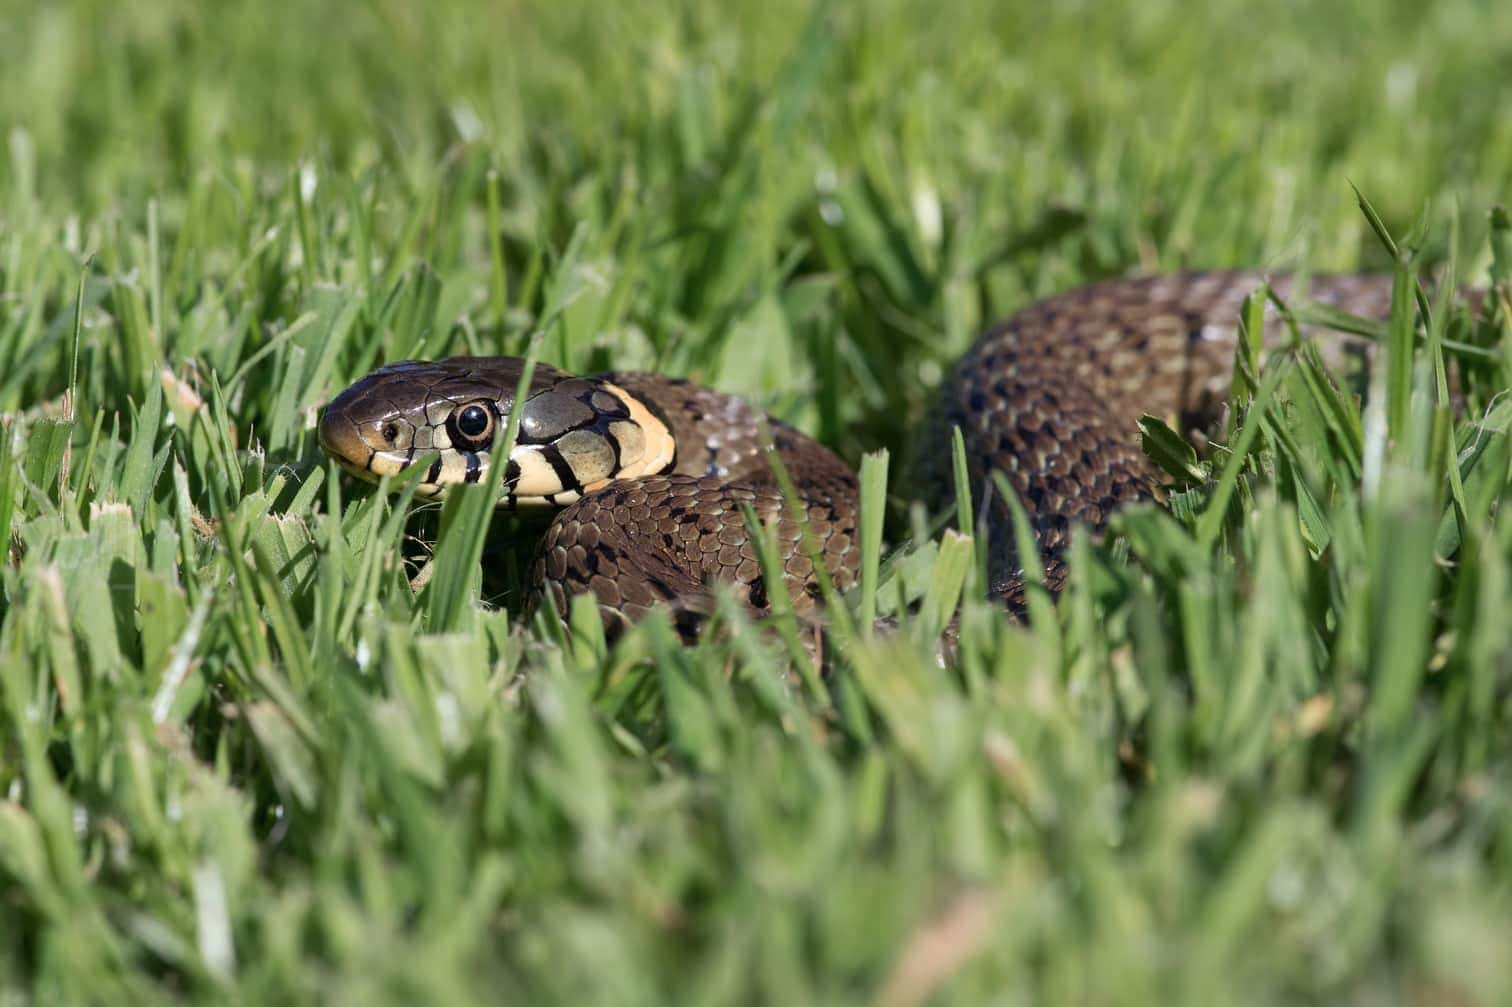 Foto: avemhuntphotography / shutterstock.com (Symbolfoto)